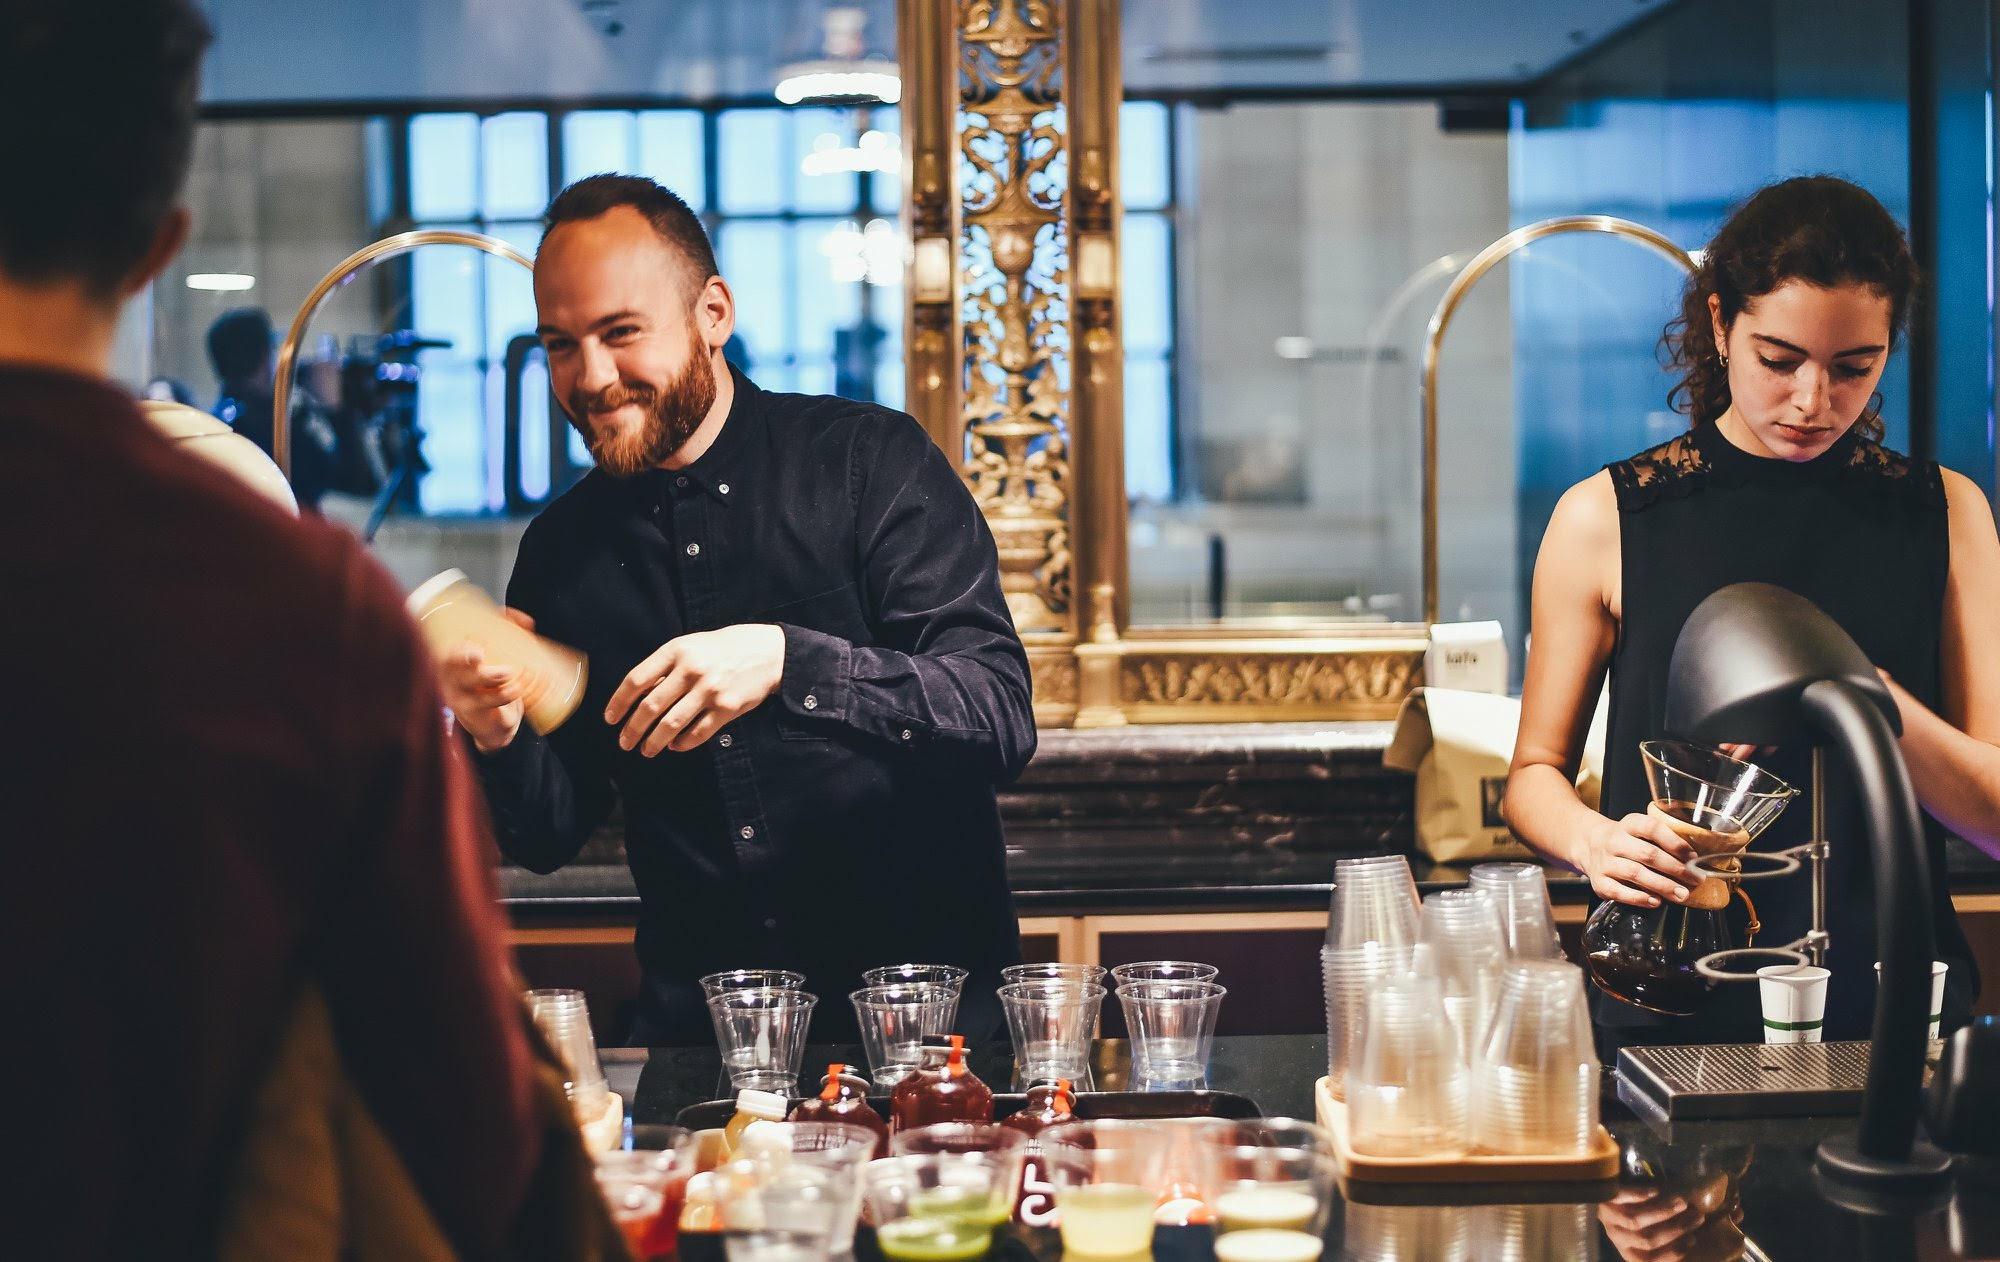 Staff Shop bartenders